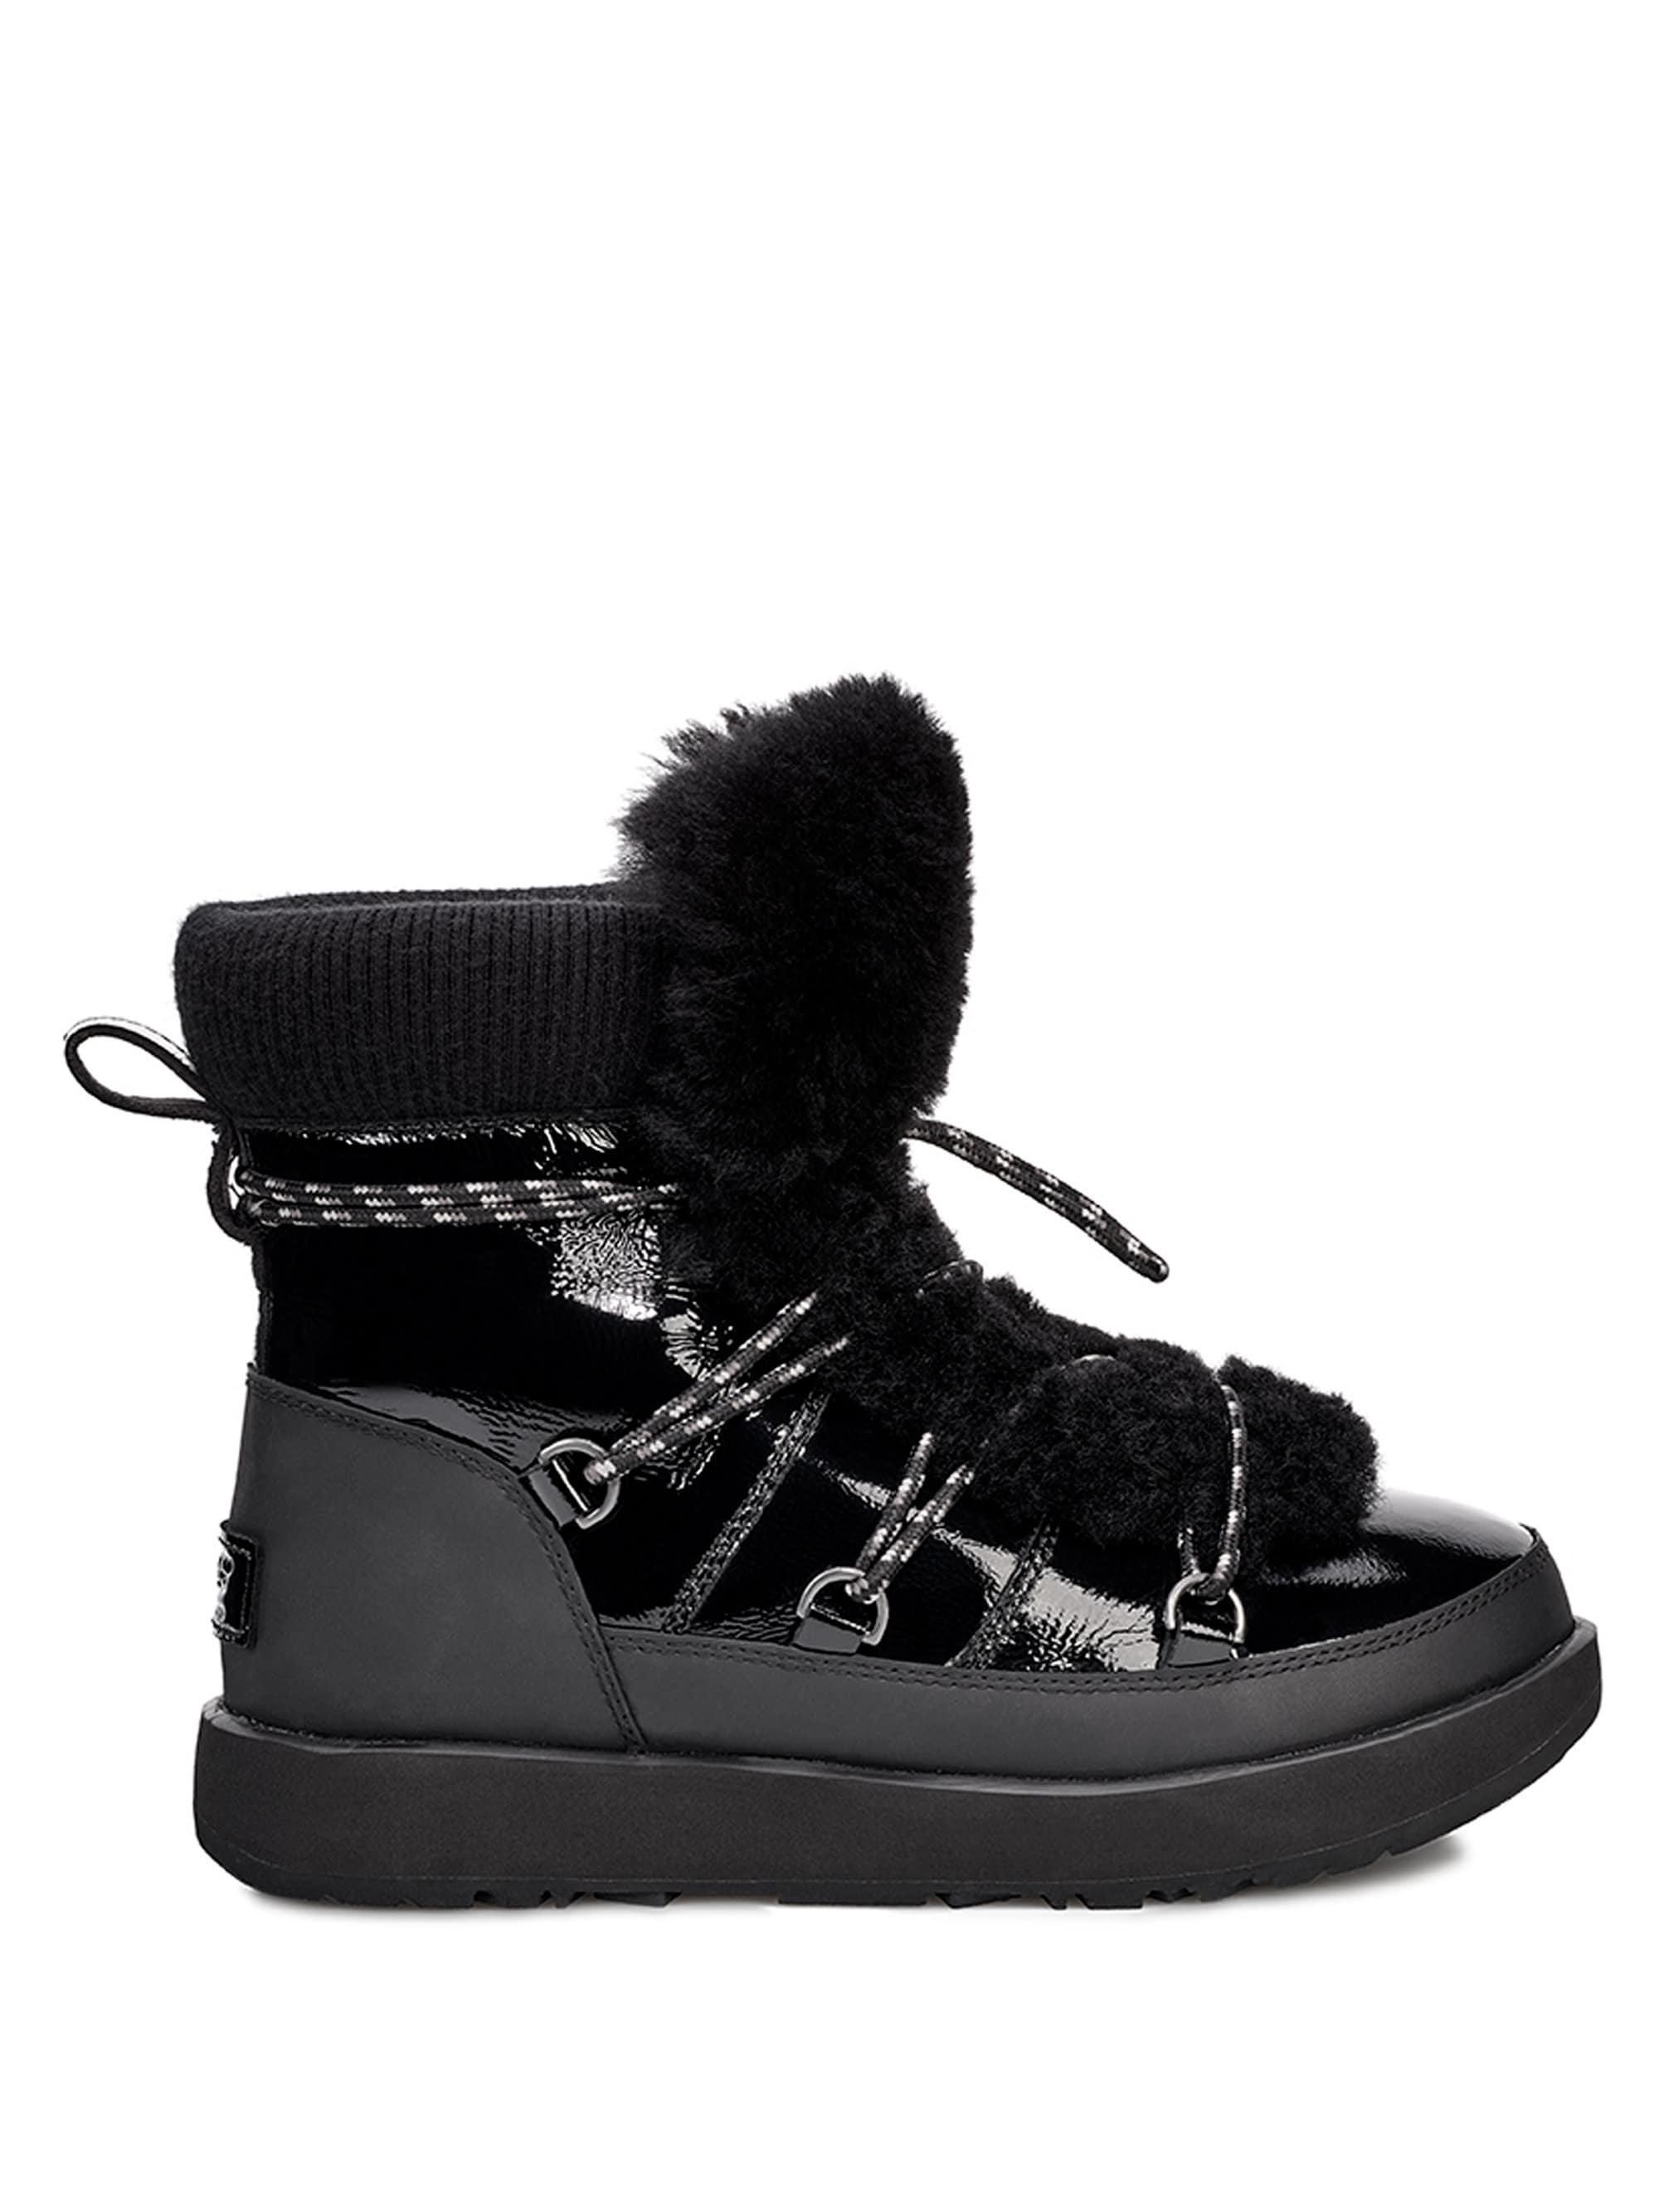 36e5d39bbe2 Ugg Black Highland Fur Trimmed Waterproof Boots